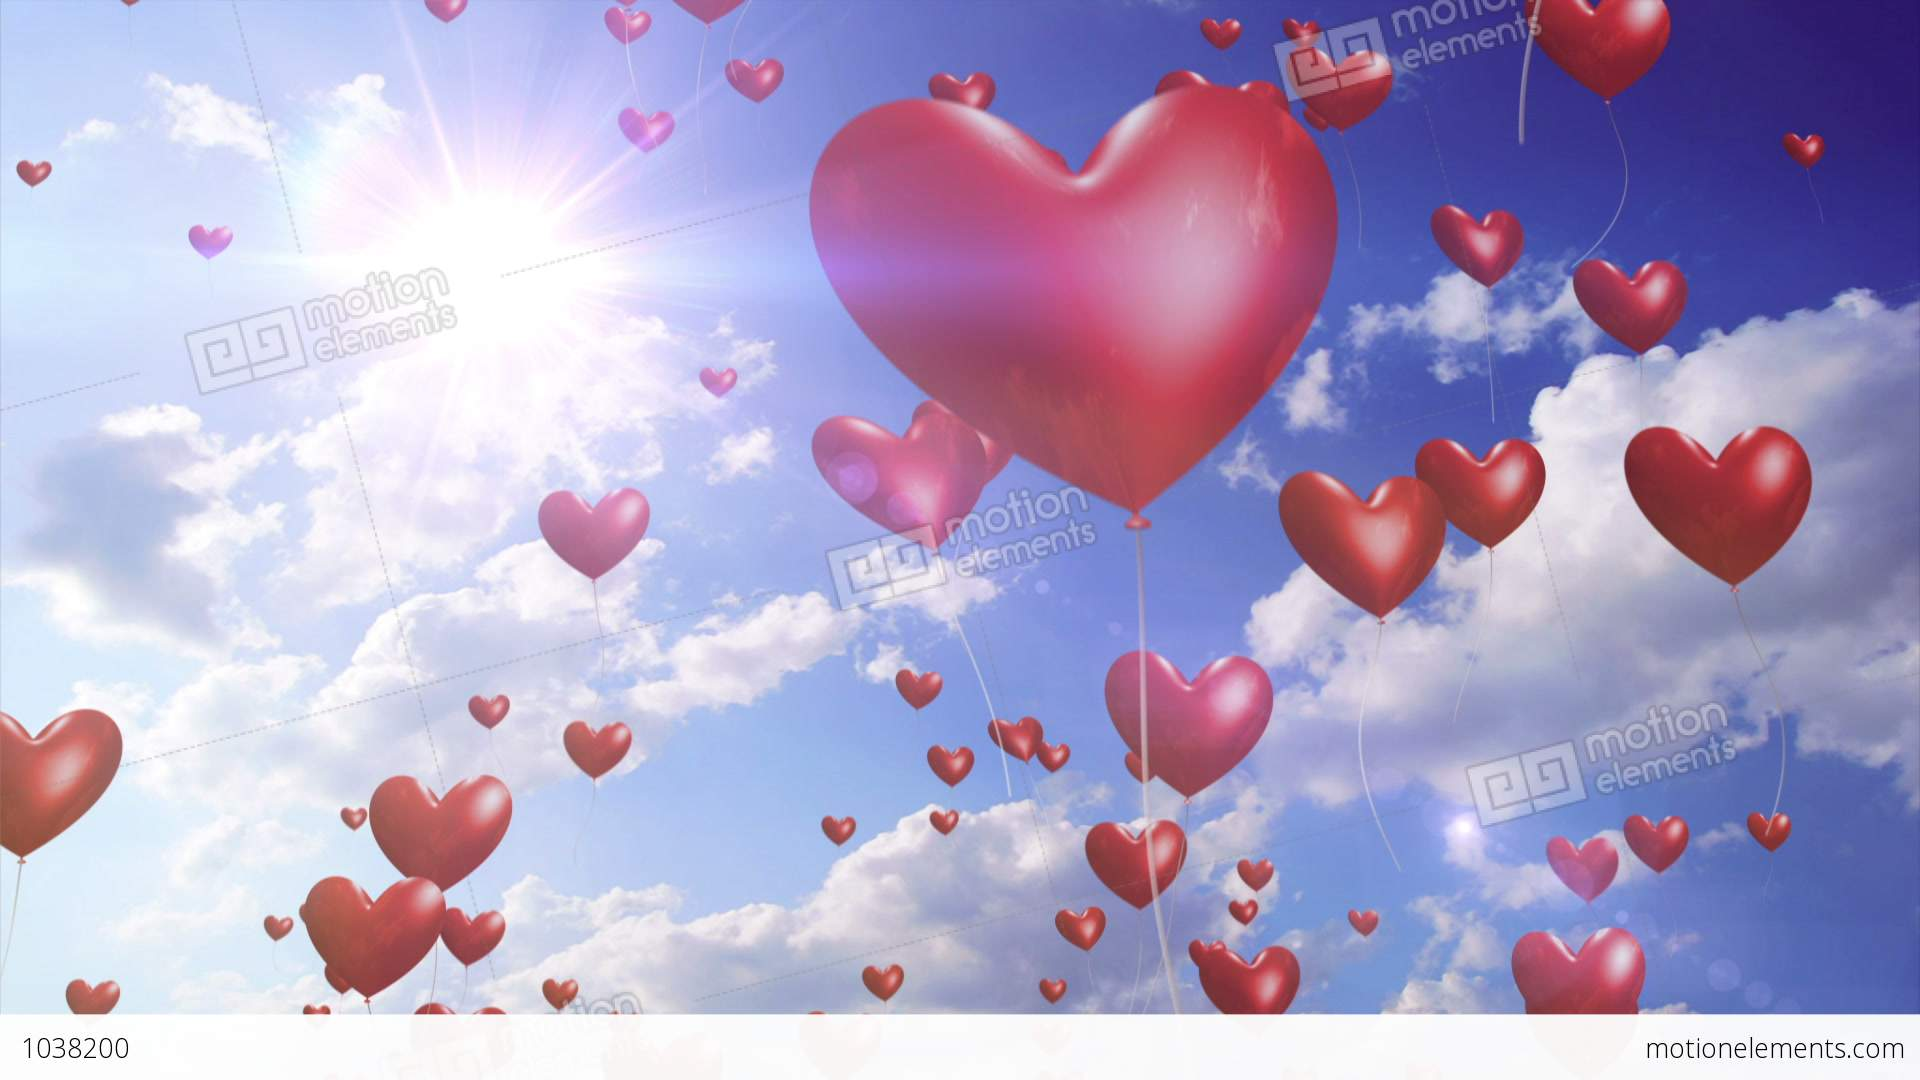 Heart Balloons Romantic Wedding Video Background Loop Stock Animation